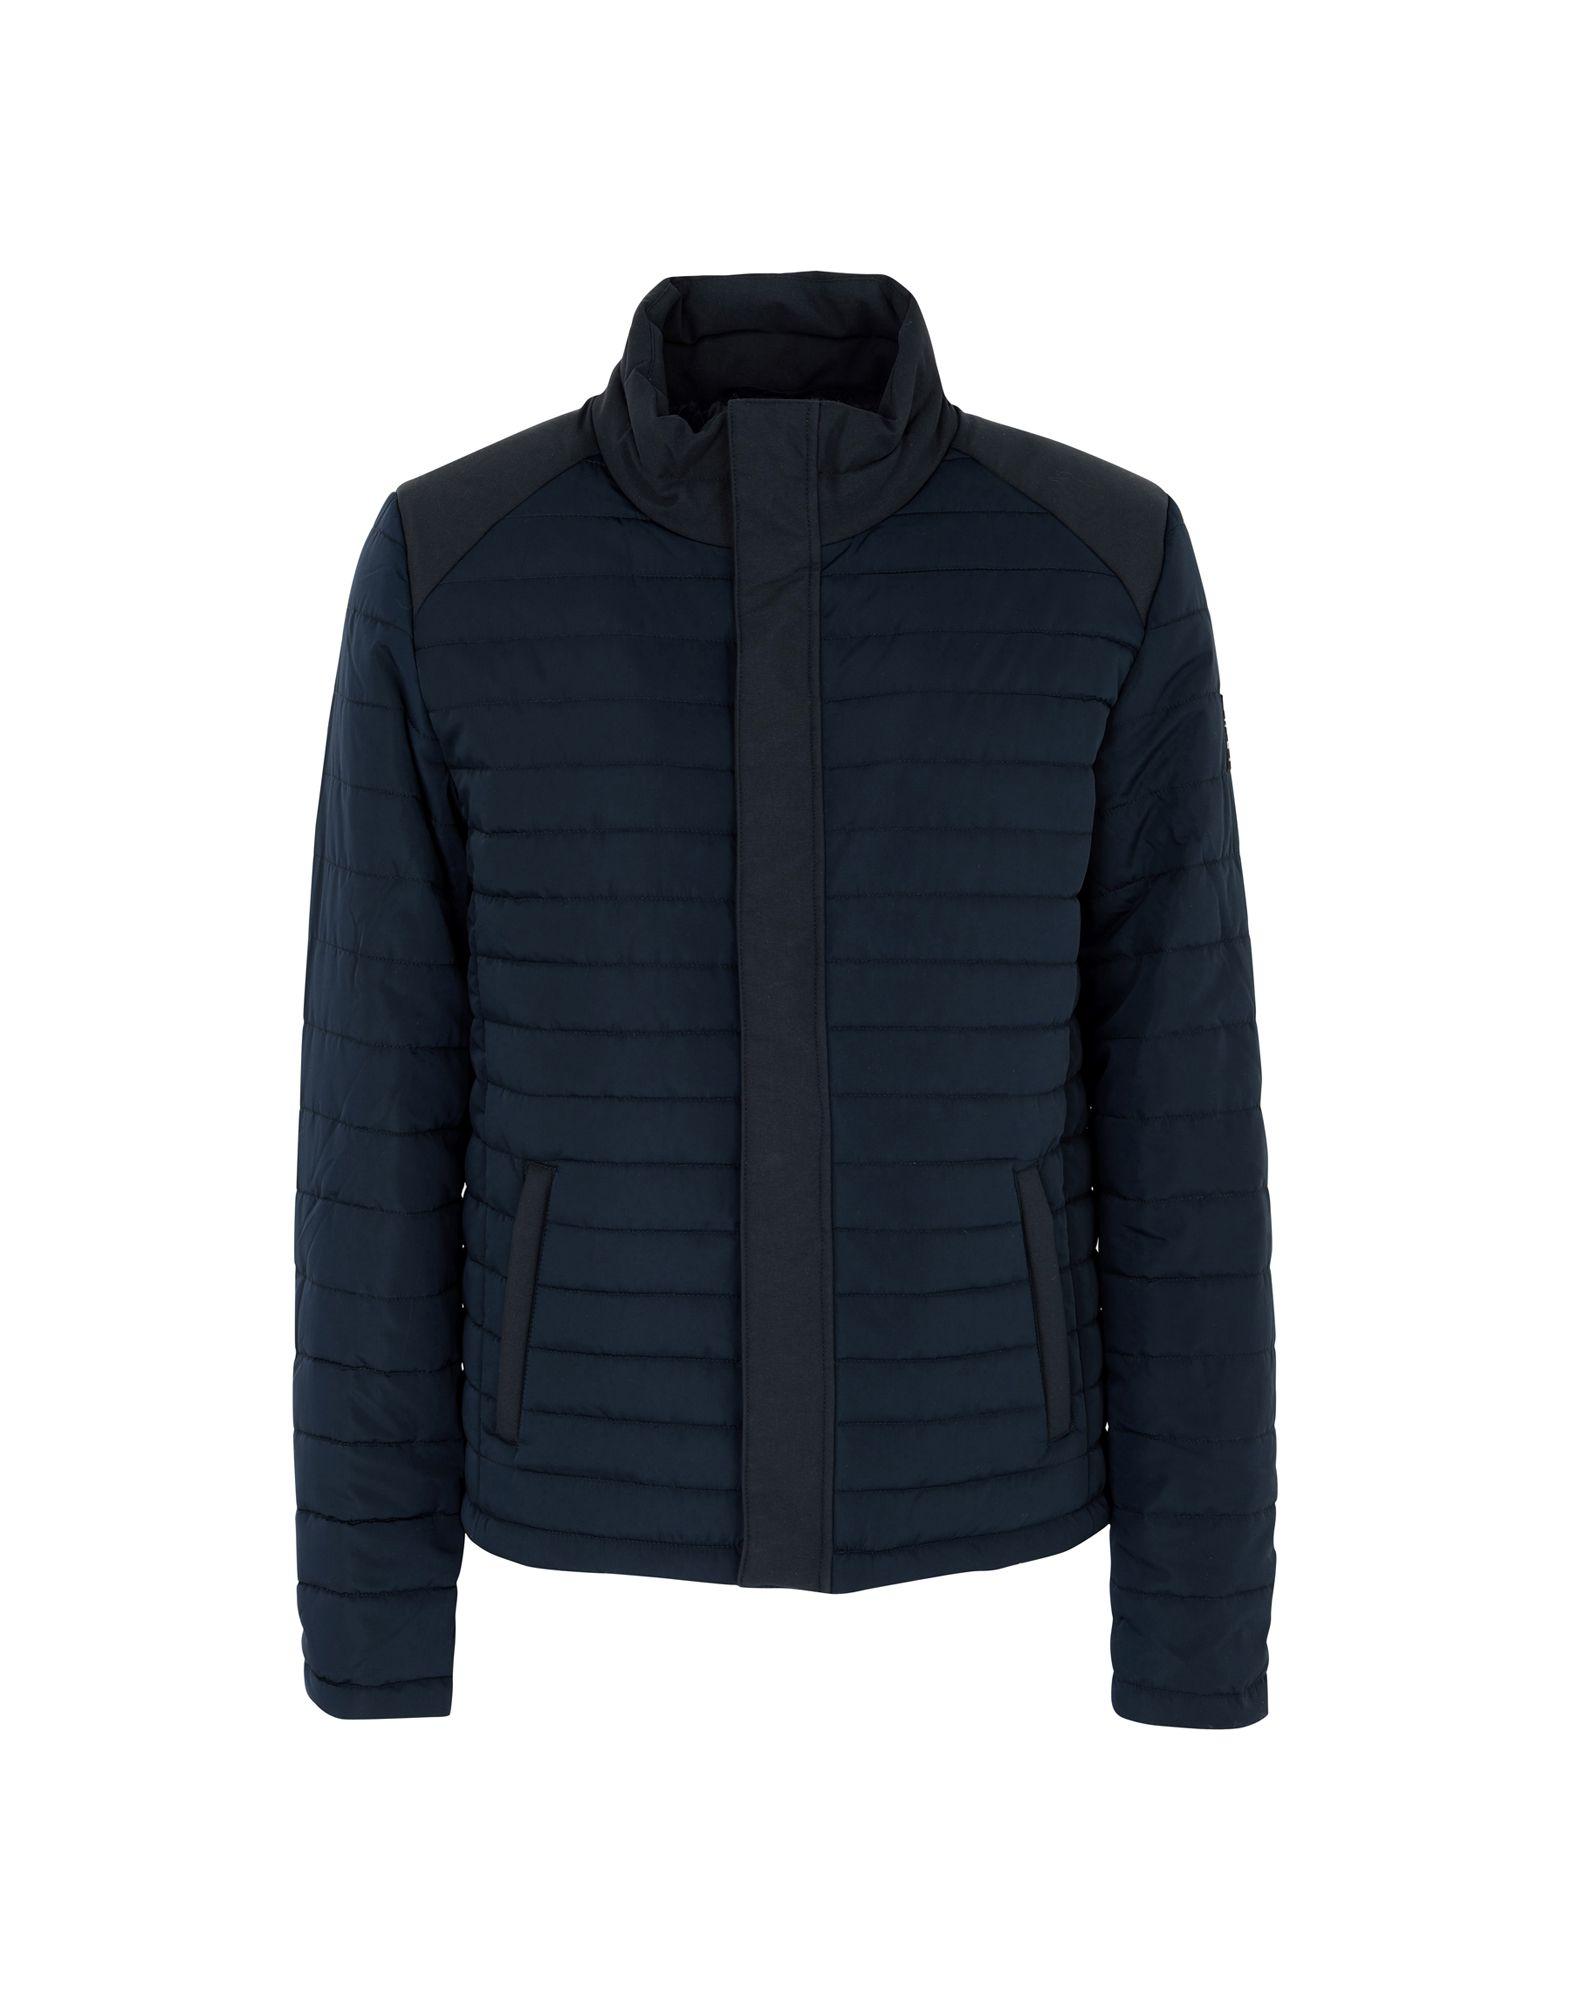 ECOALF Synthetic Down Jackets in Dark Blue